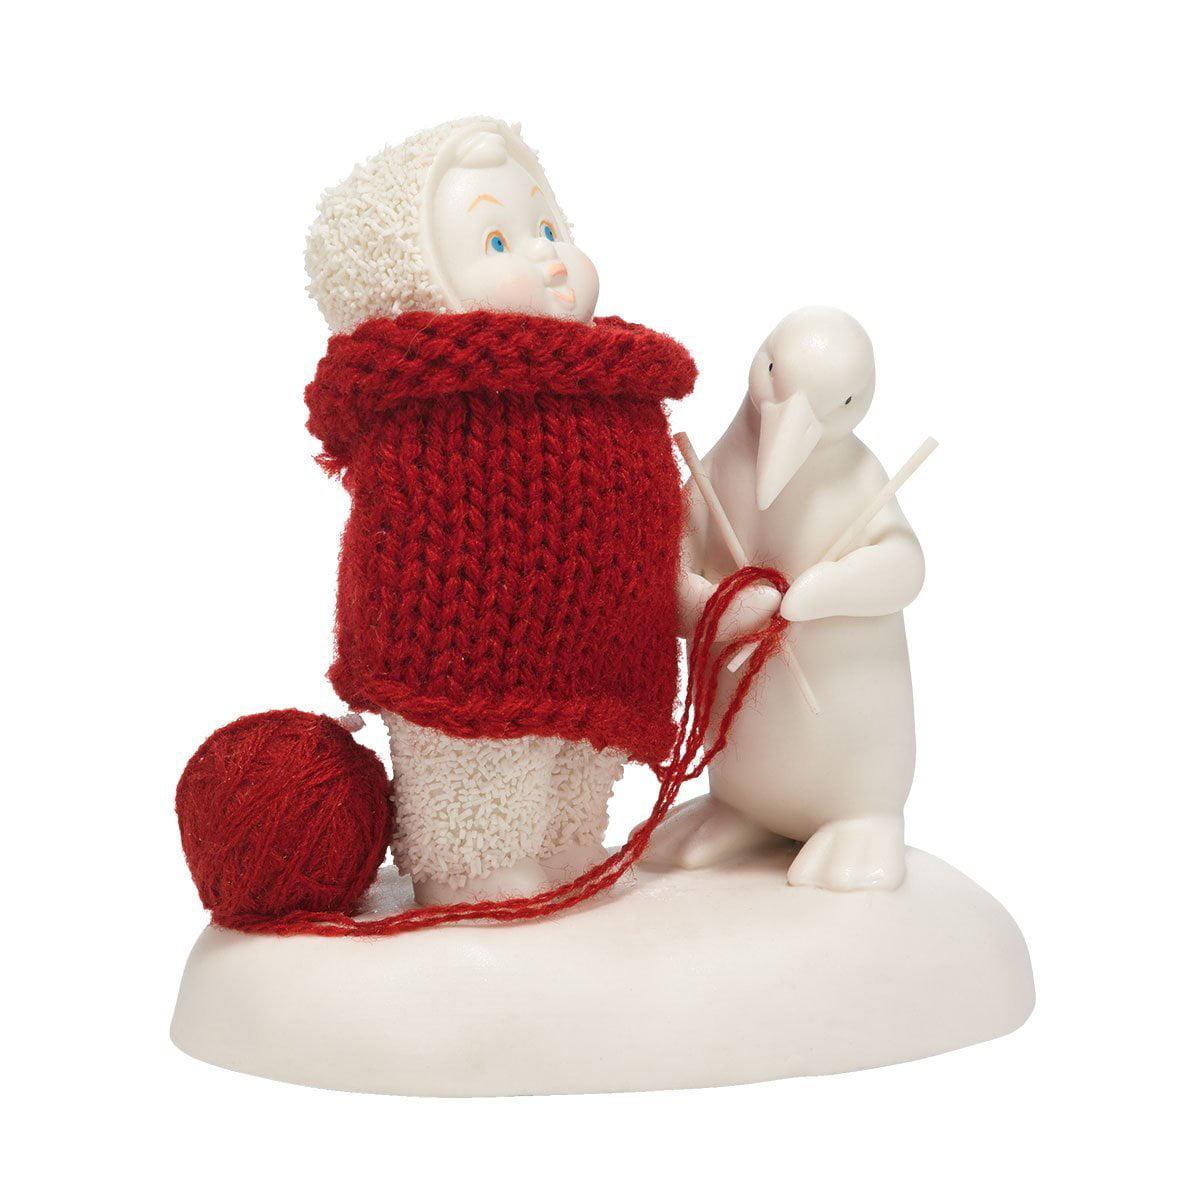 Snowbabies Department 56 Snowbabies Classics My Christmas Sweater Figurine, 4.25-Inch